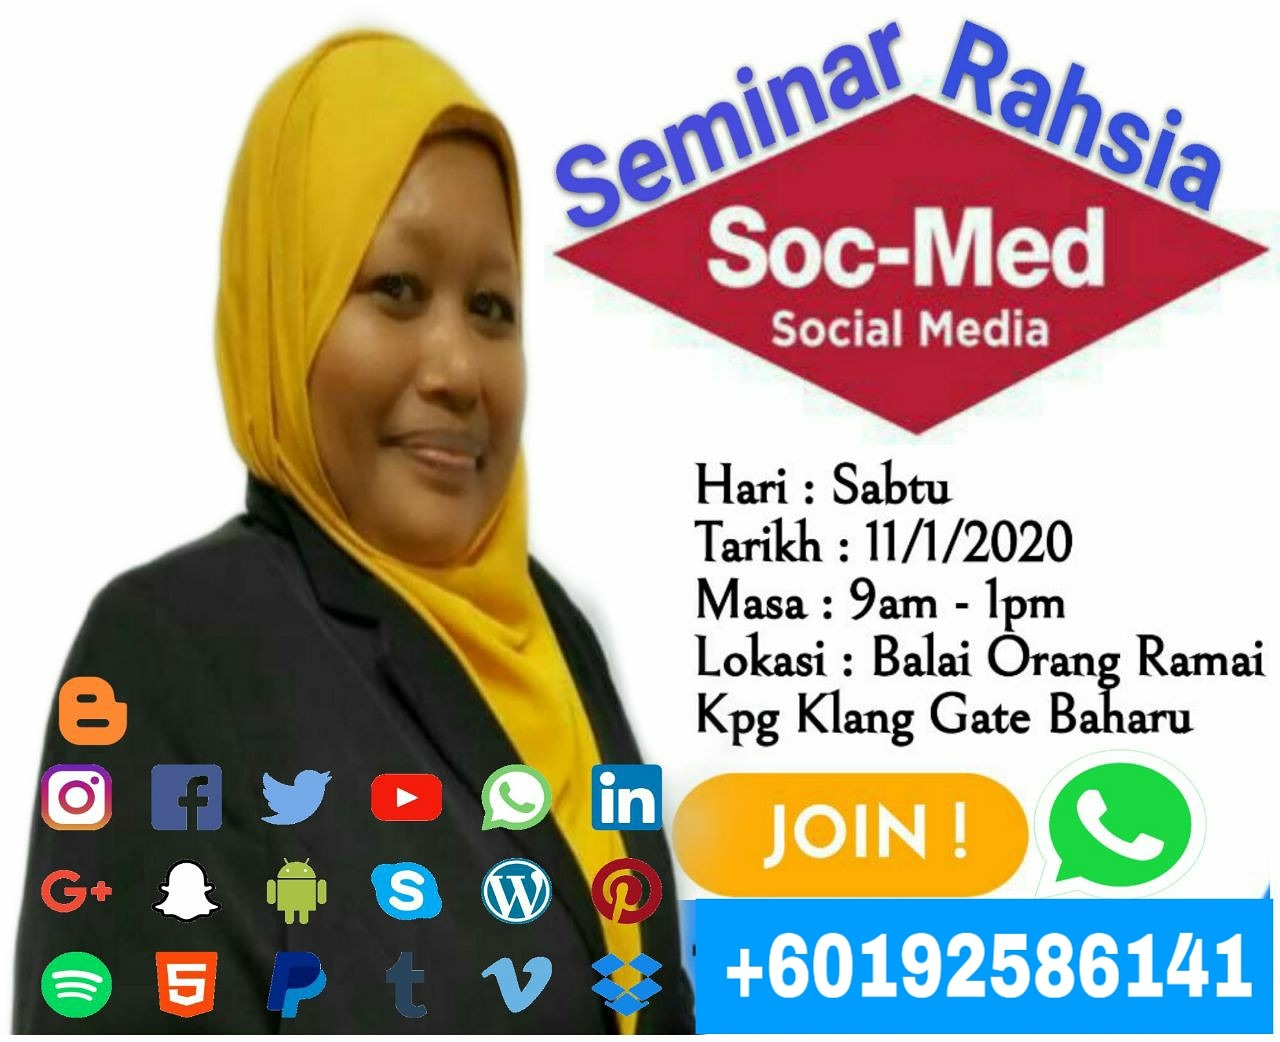 SEMINAR RAHSIA SOCIAL MEDIA